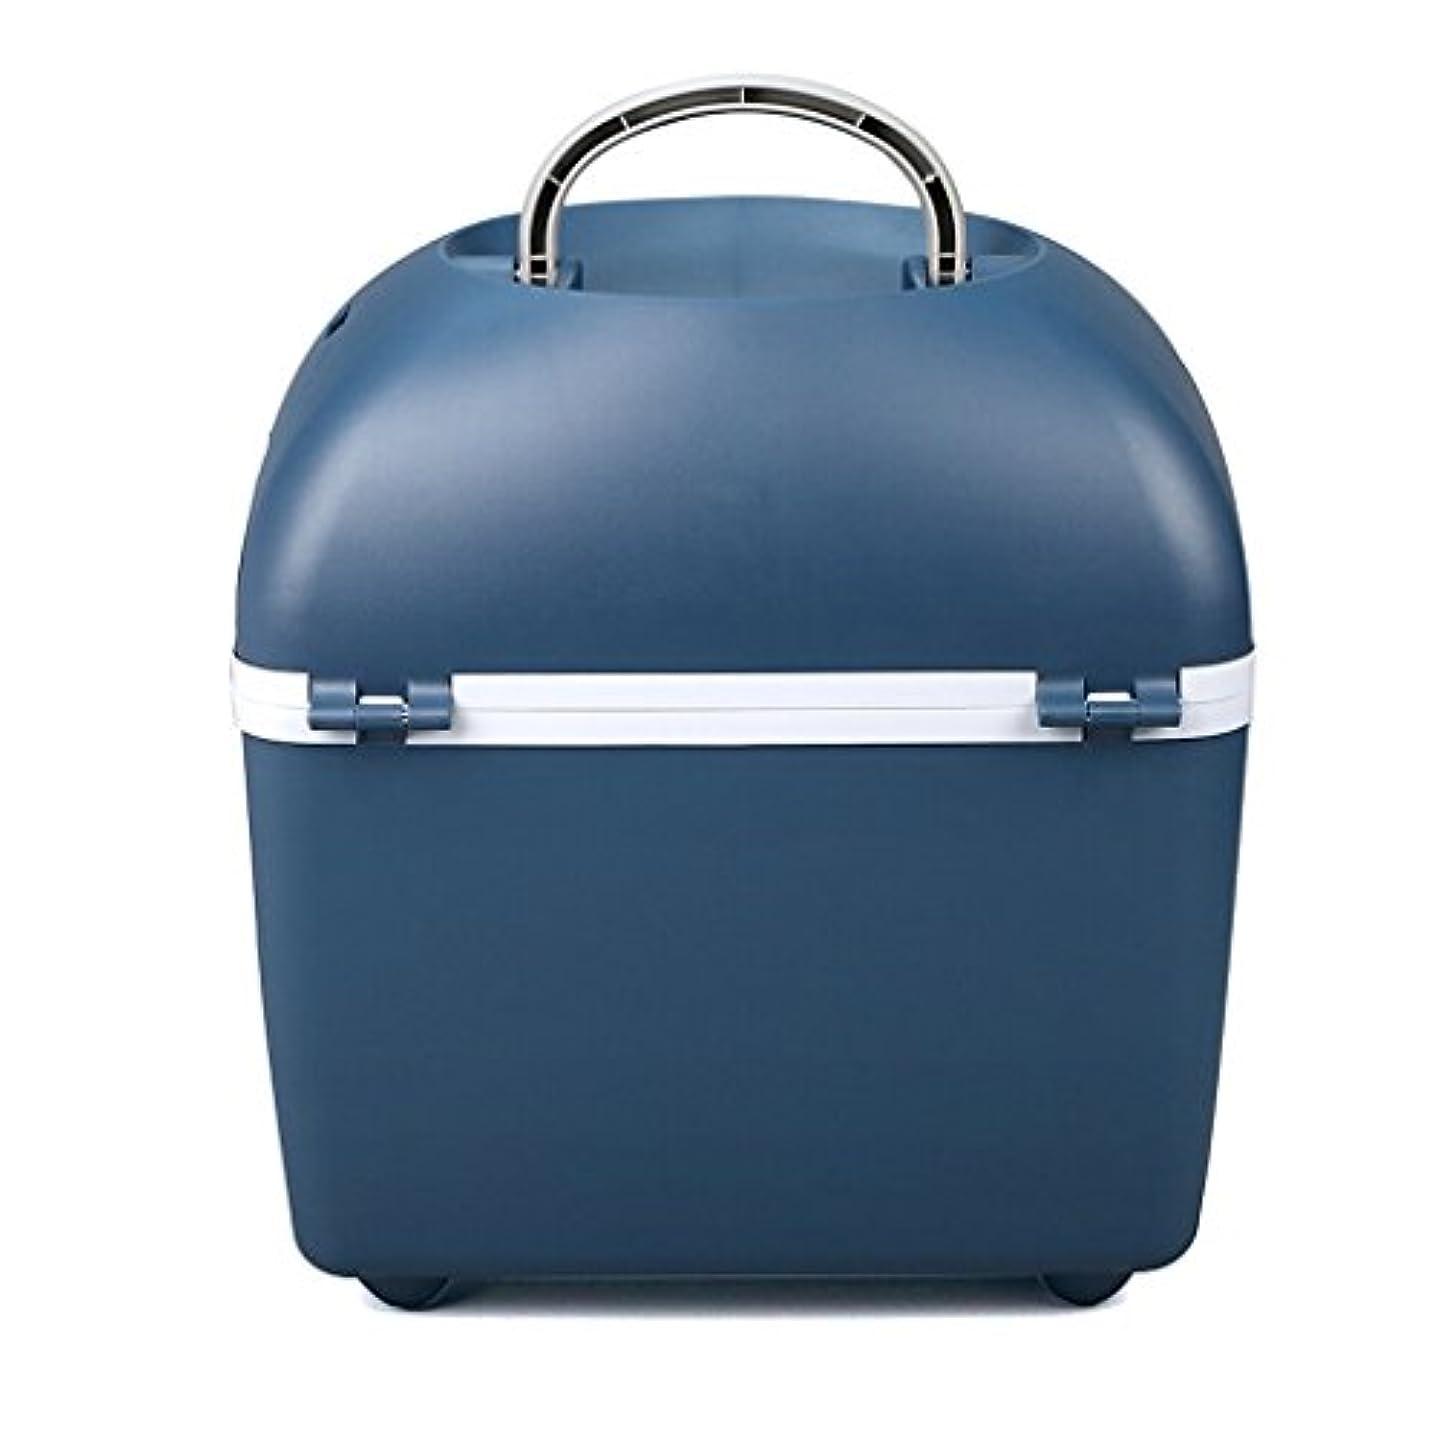 Mini Fridge - 20L Compact Refrigerator Holds 24 x 330ml Cans |